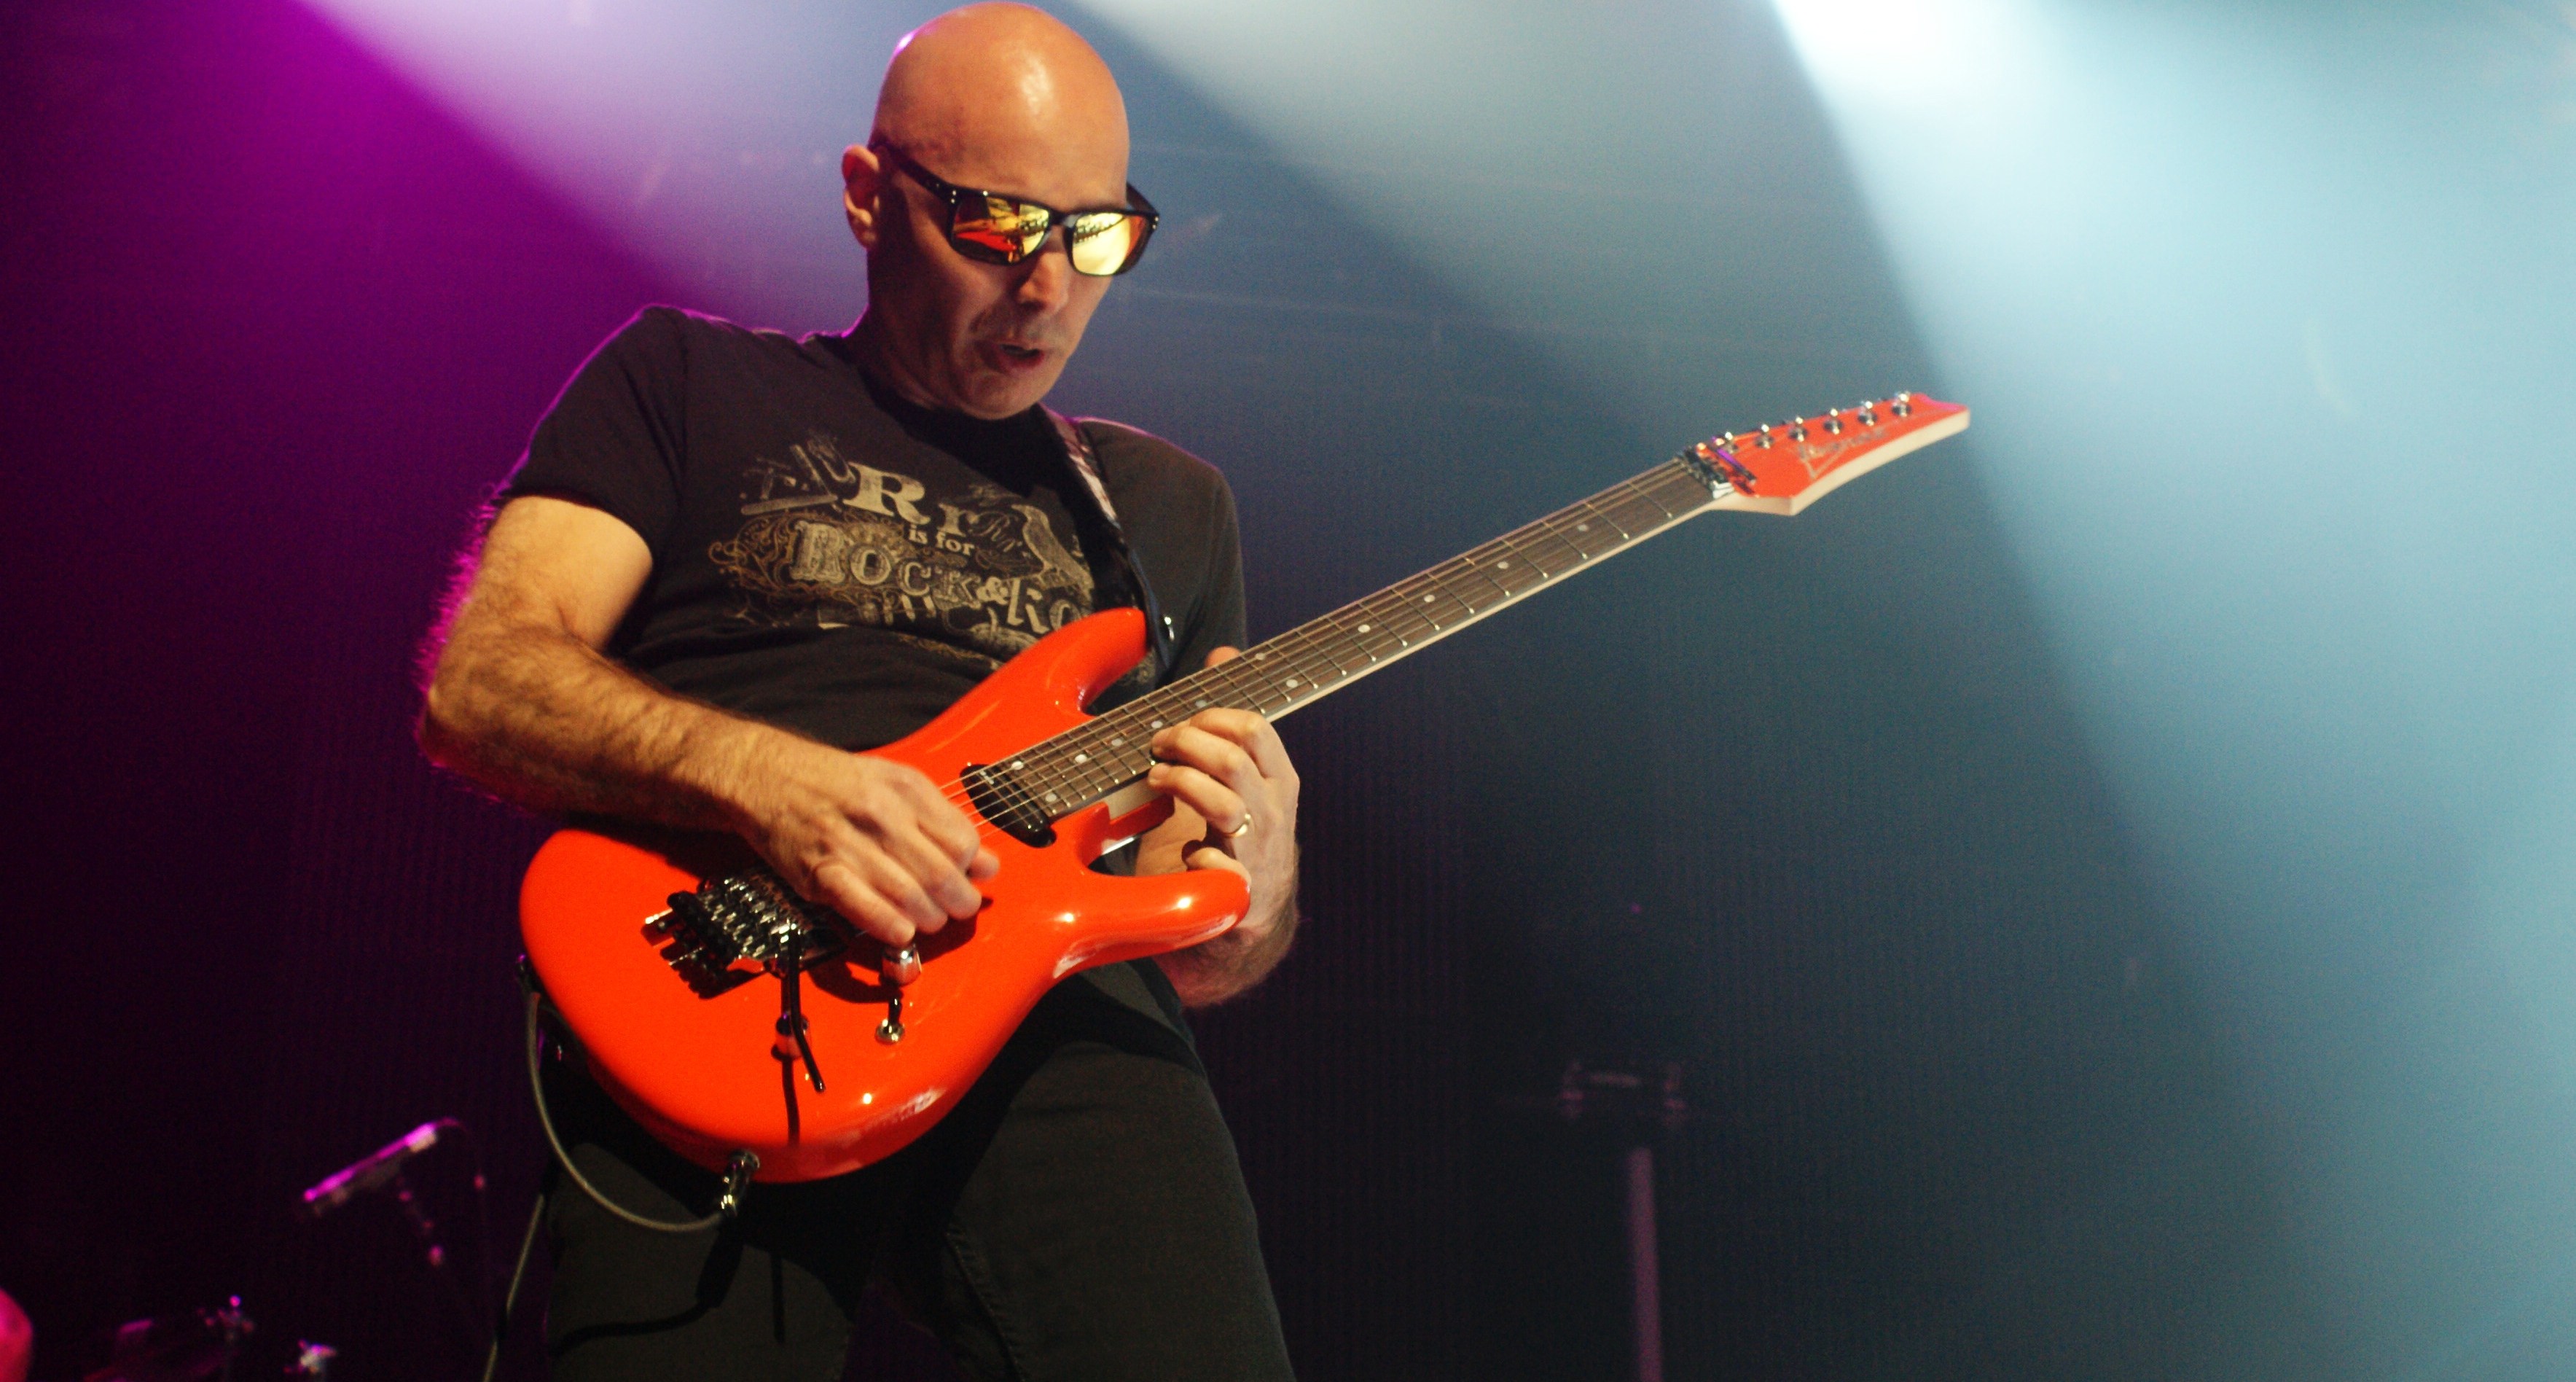 Joe Satriani Birmingham by joewinn 3535x1896